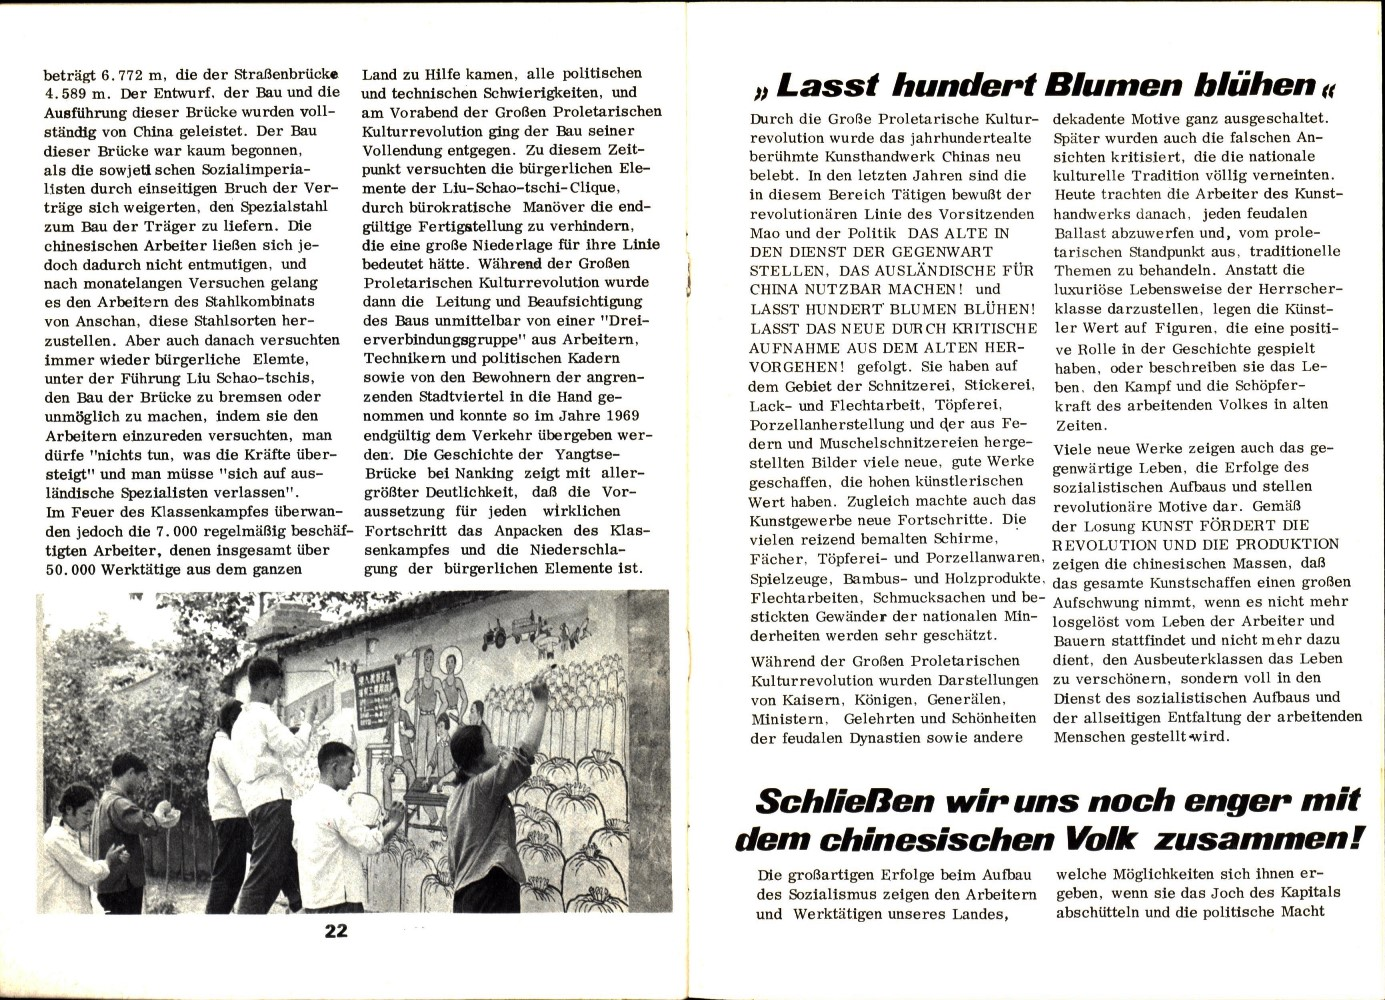 KPDAO_1975_Nationalausstellung_VRCh_in_Koeln_12